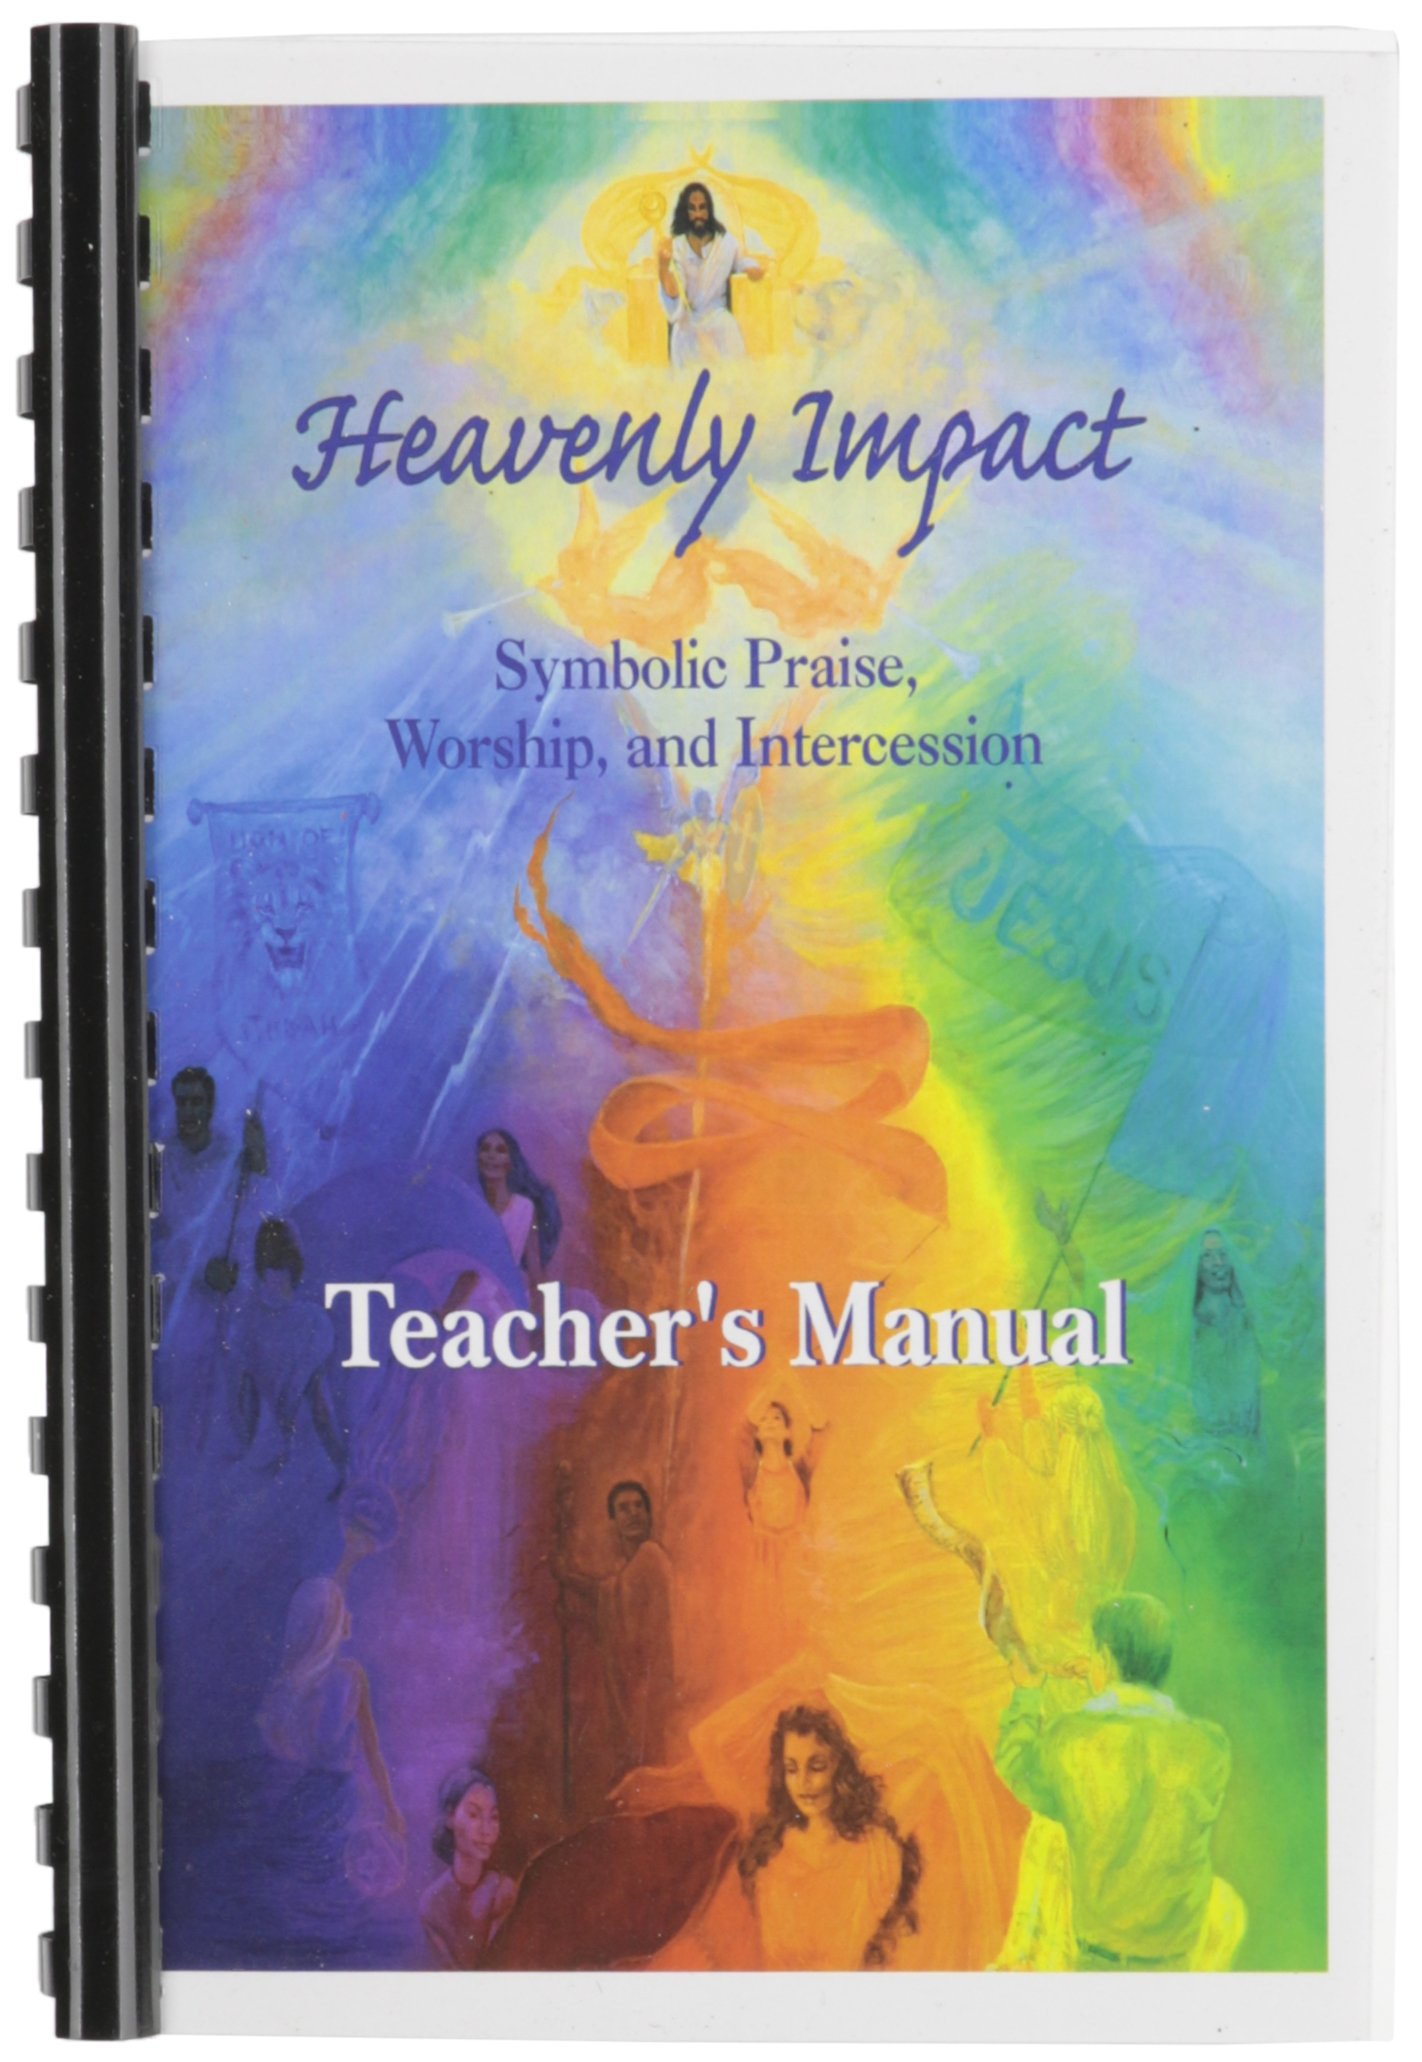 Teacher's Manual for Heavenly Impact Book: Jeanette Strauss, Mary Ann  Woodcox: 9780977018055: Amazon.com: Books